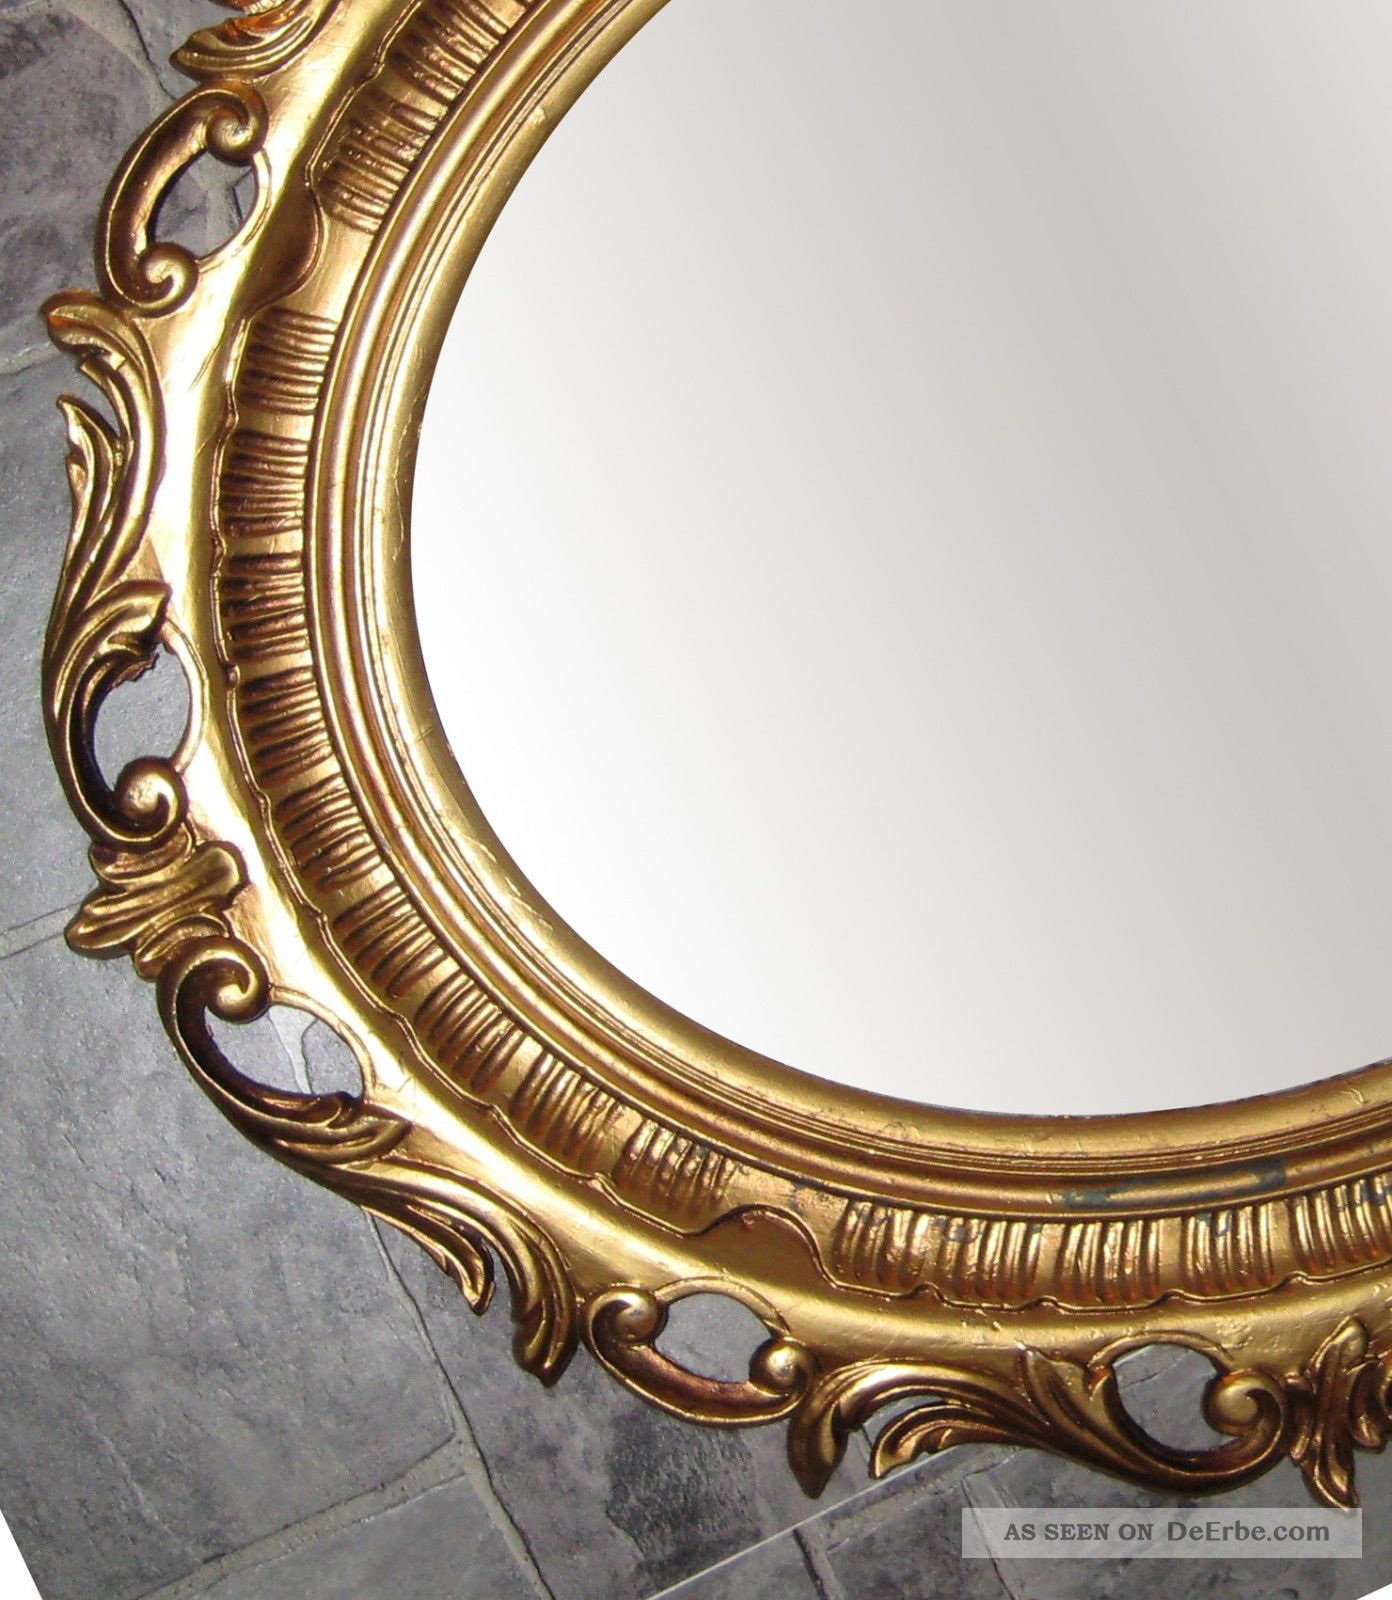 wandspiegel spiegel gold antik barock 58x68 cm modern oval rokoko 41 8. Black Bedroom Furniture Sets. Home Design Ideas